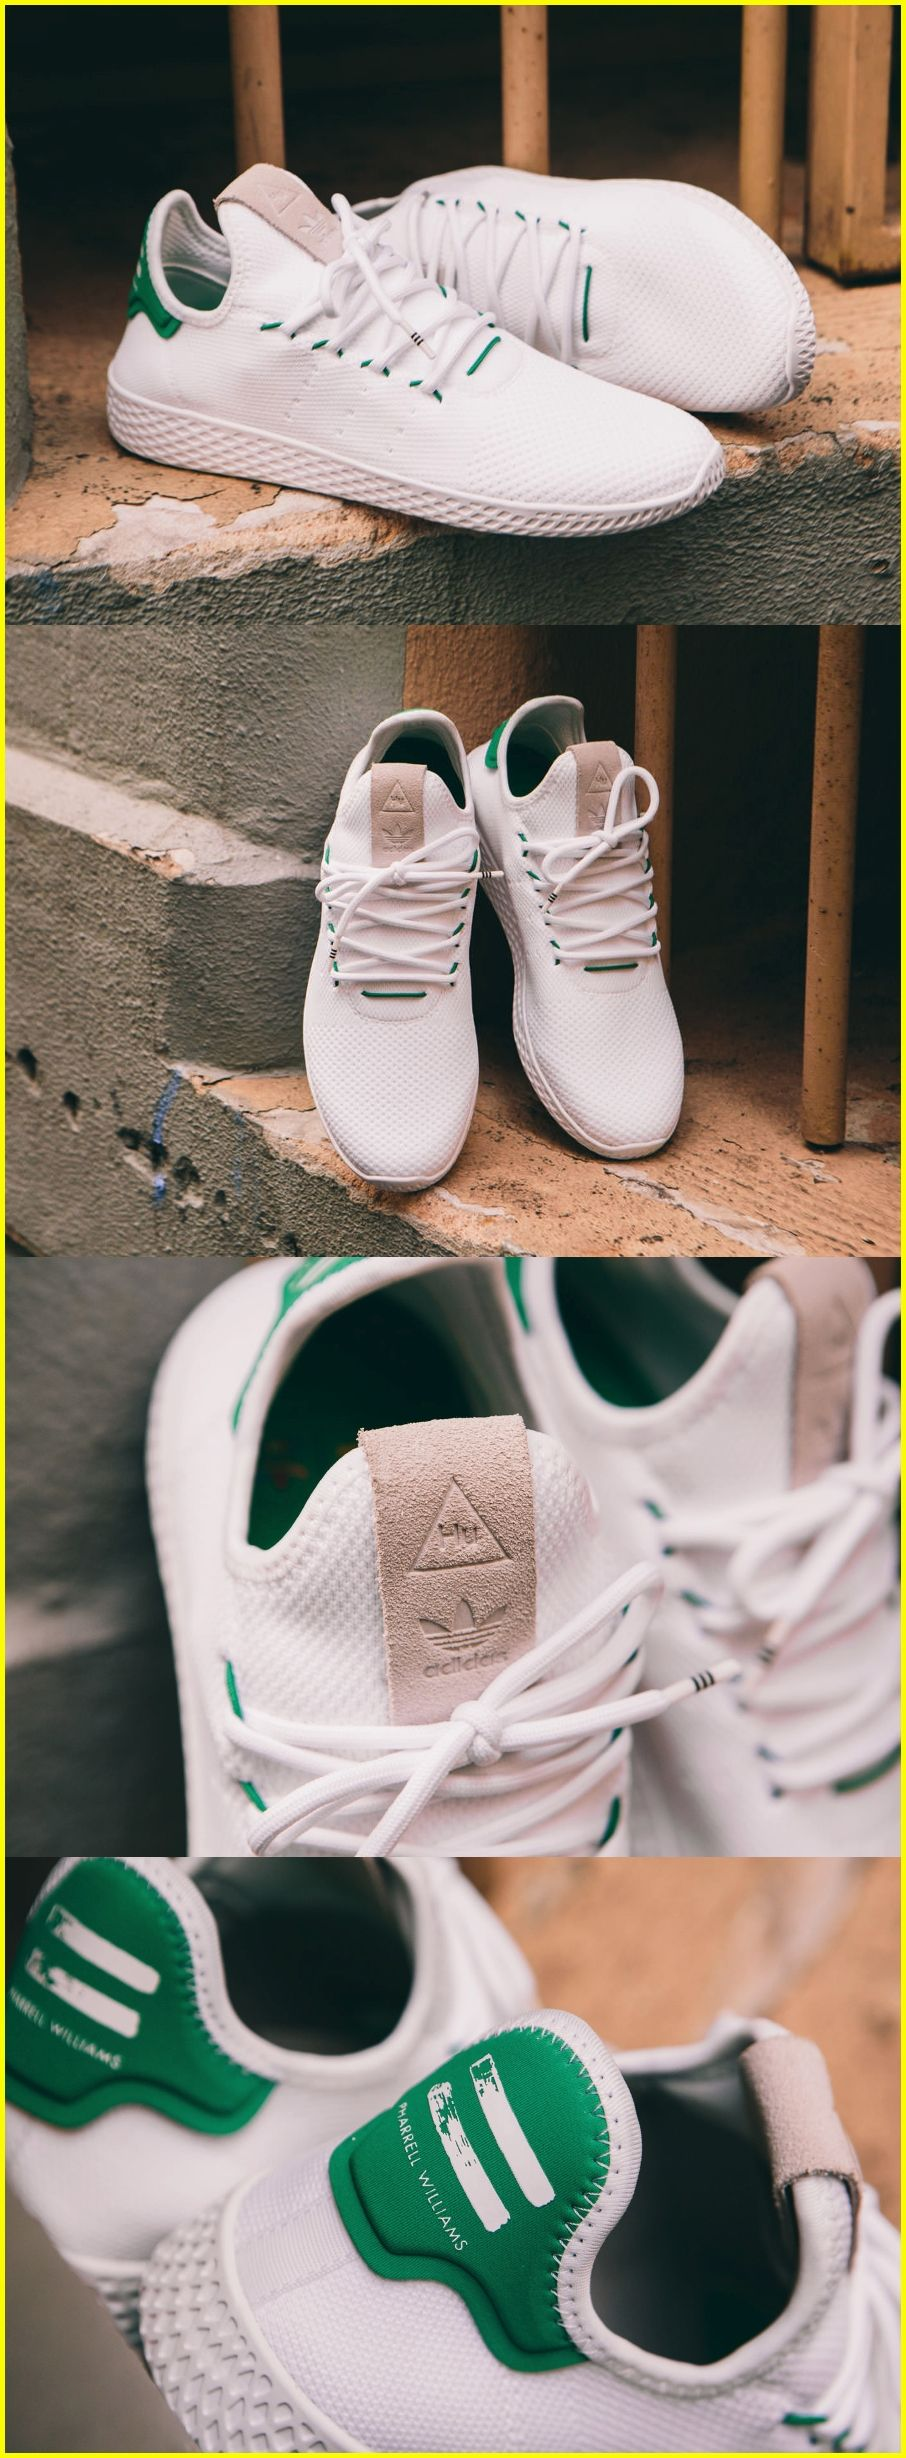 Adidas PW Tennis HU Pharrell Williams Human Race BA7828